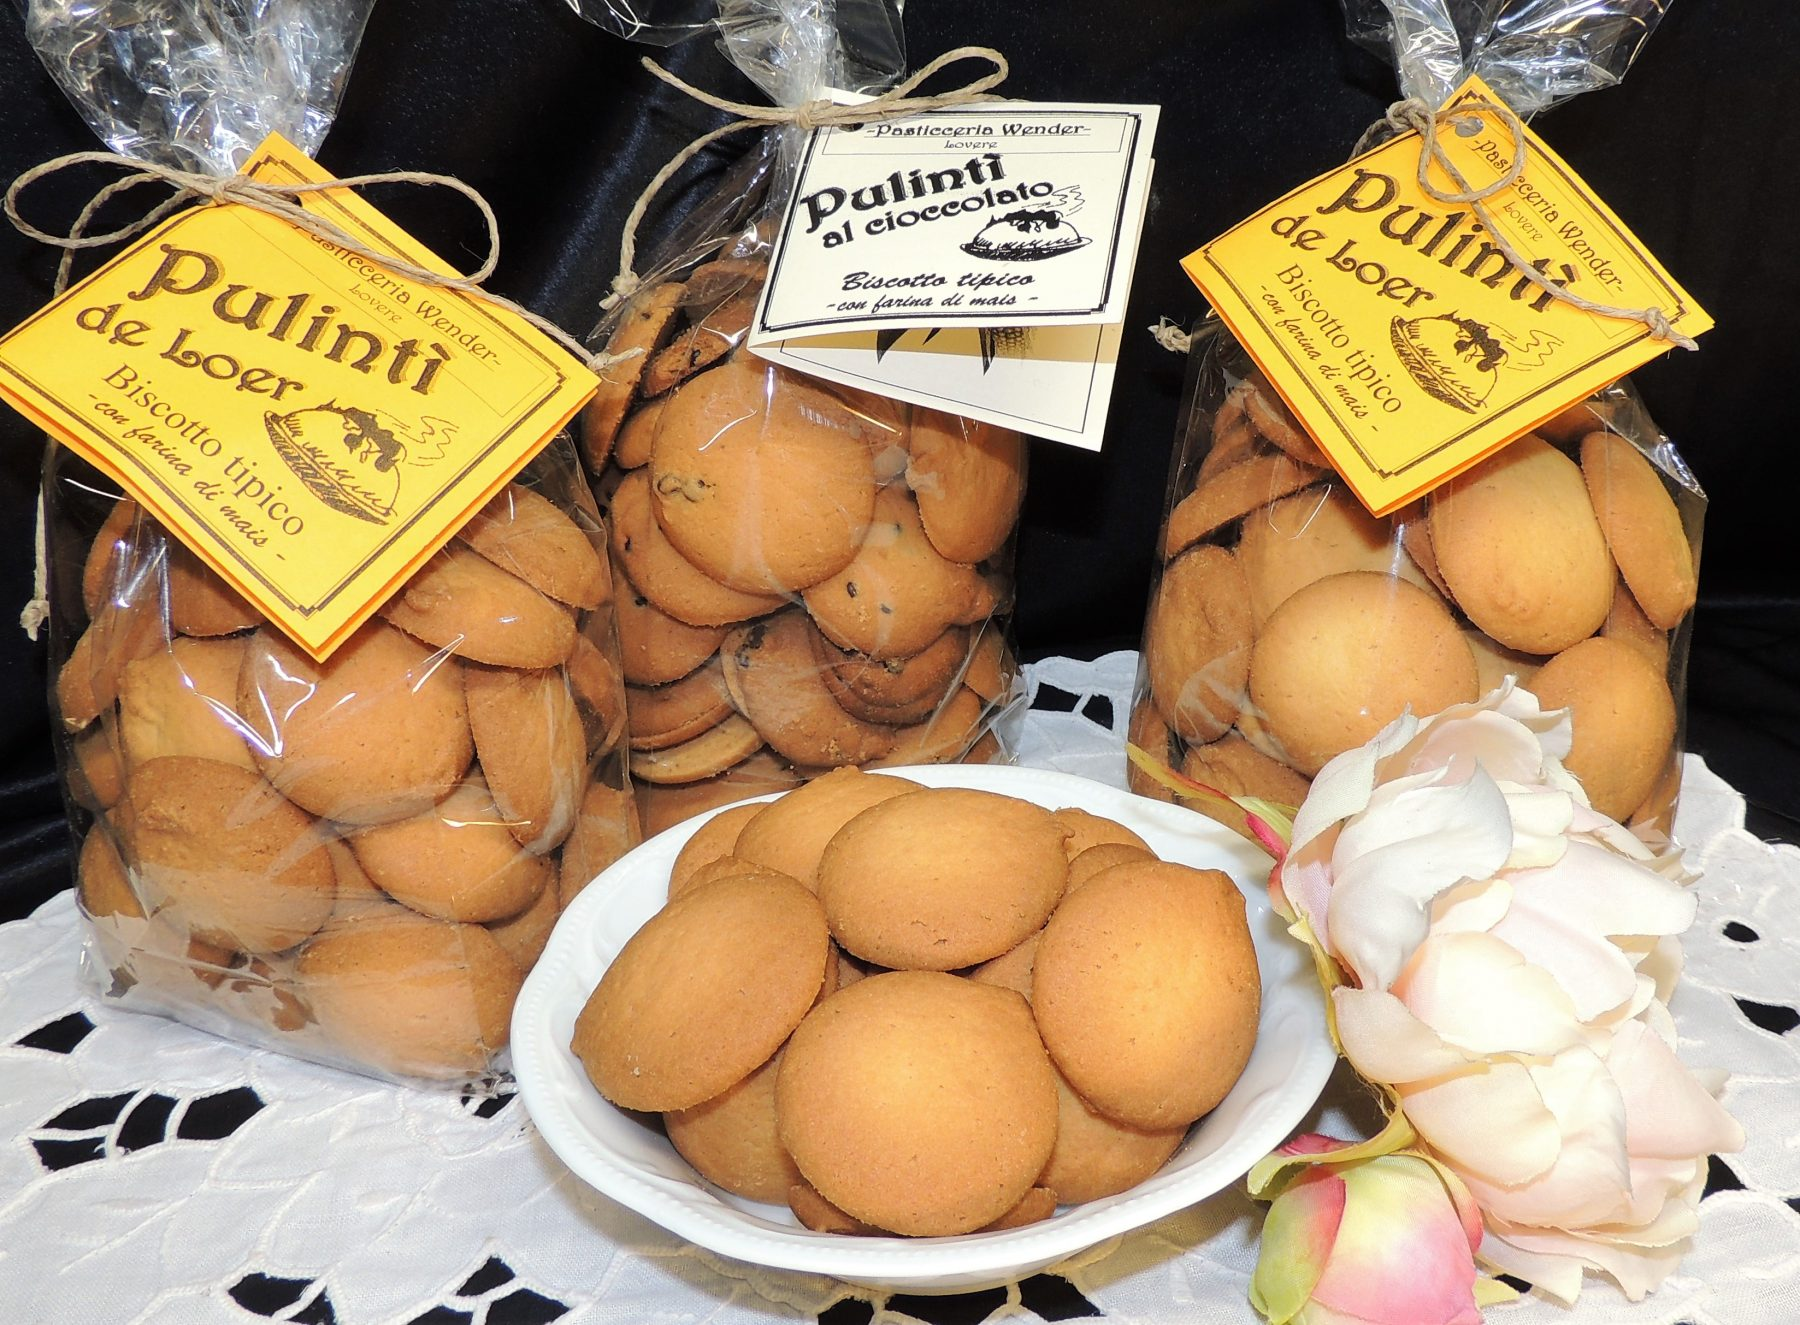 biscotto pulintì de Loer